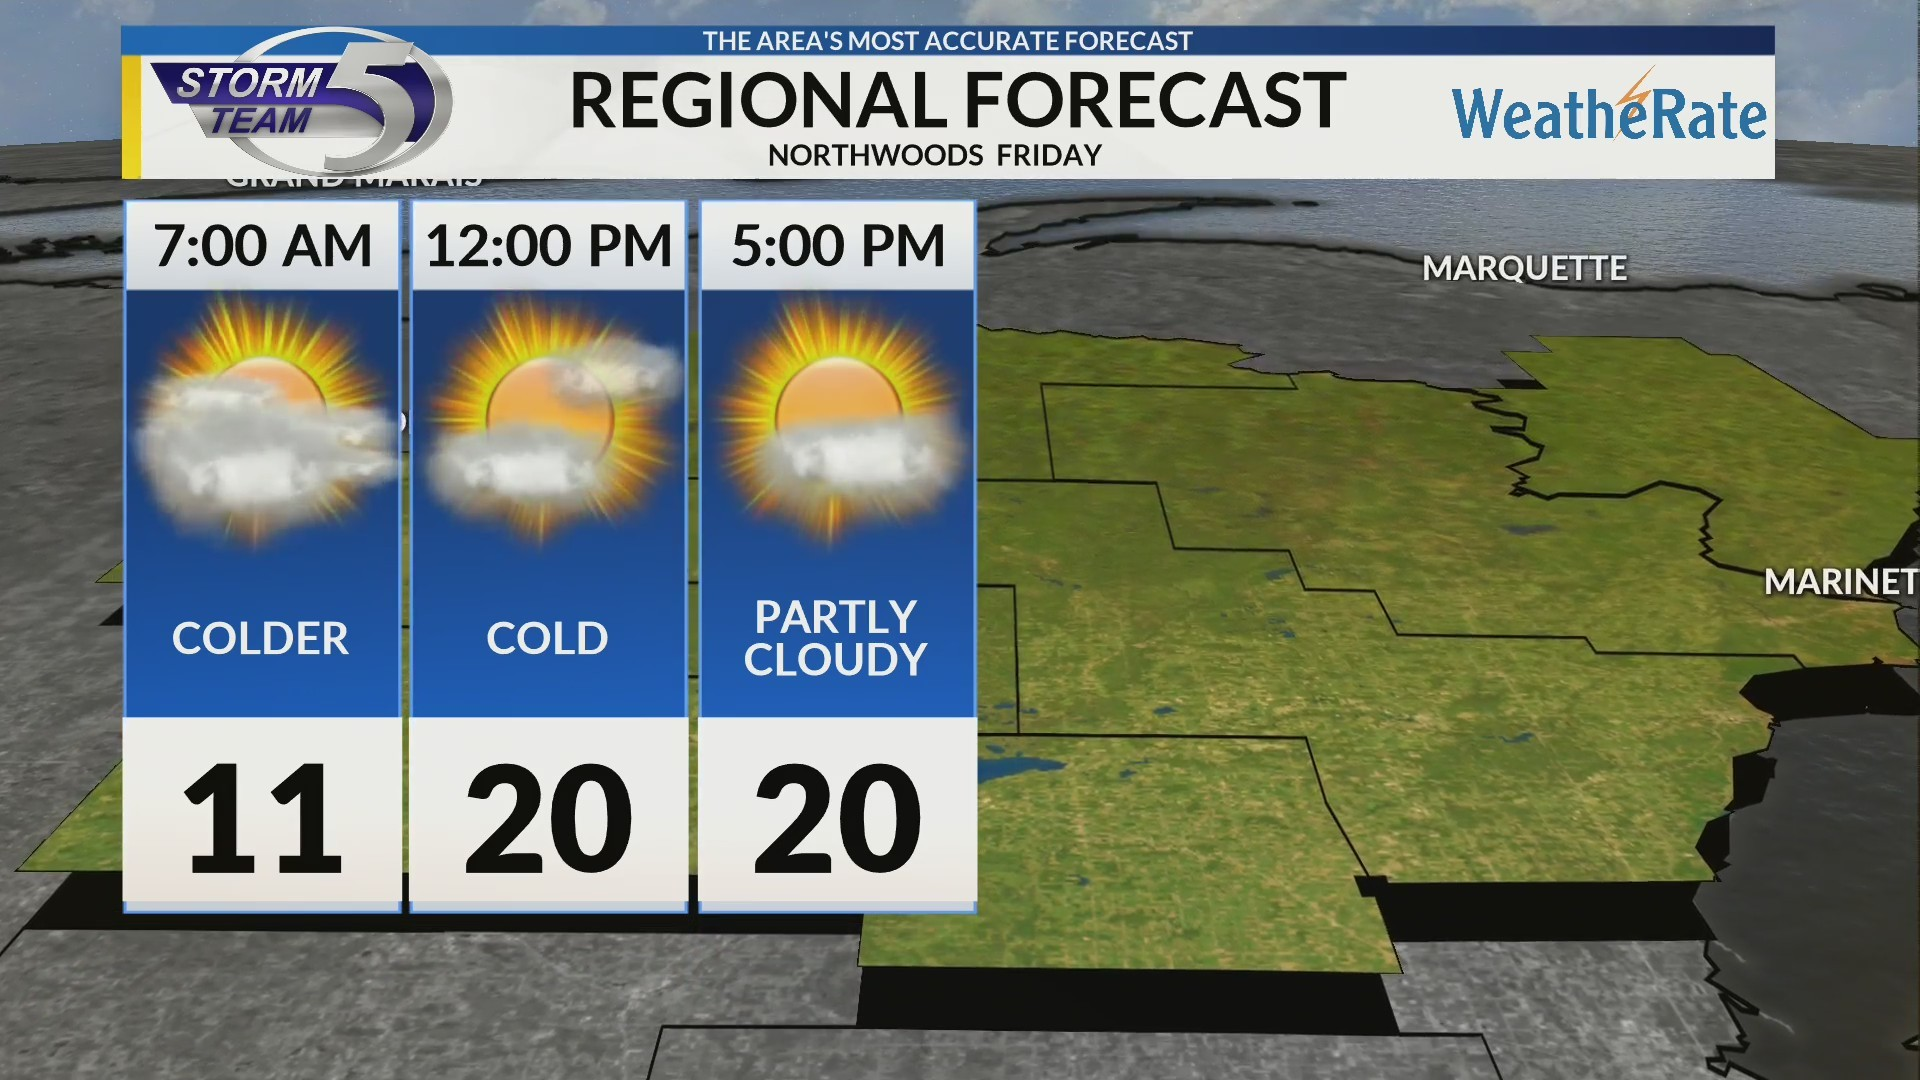 Regional Forecast: Northwoods 2/15/2019